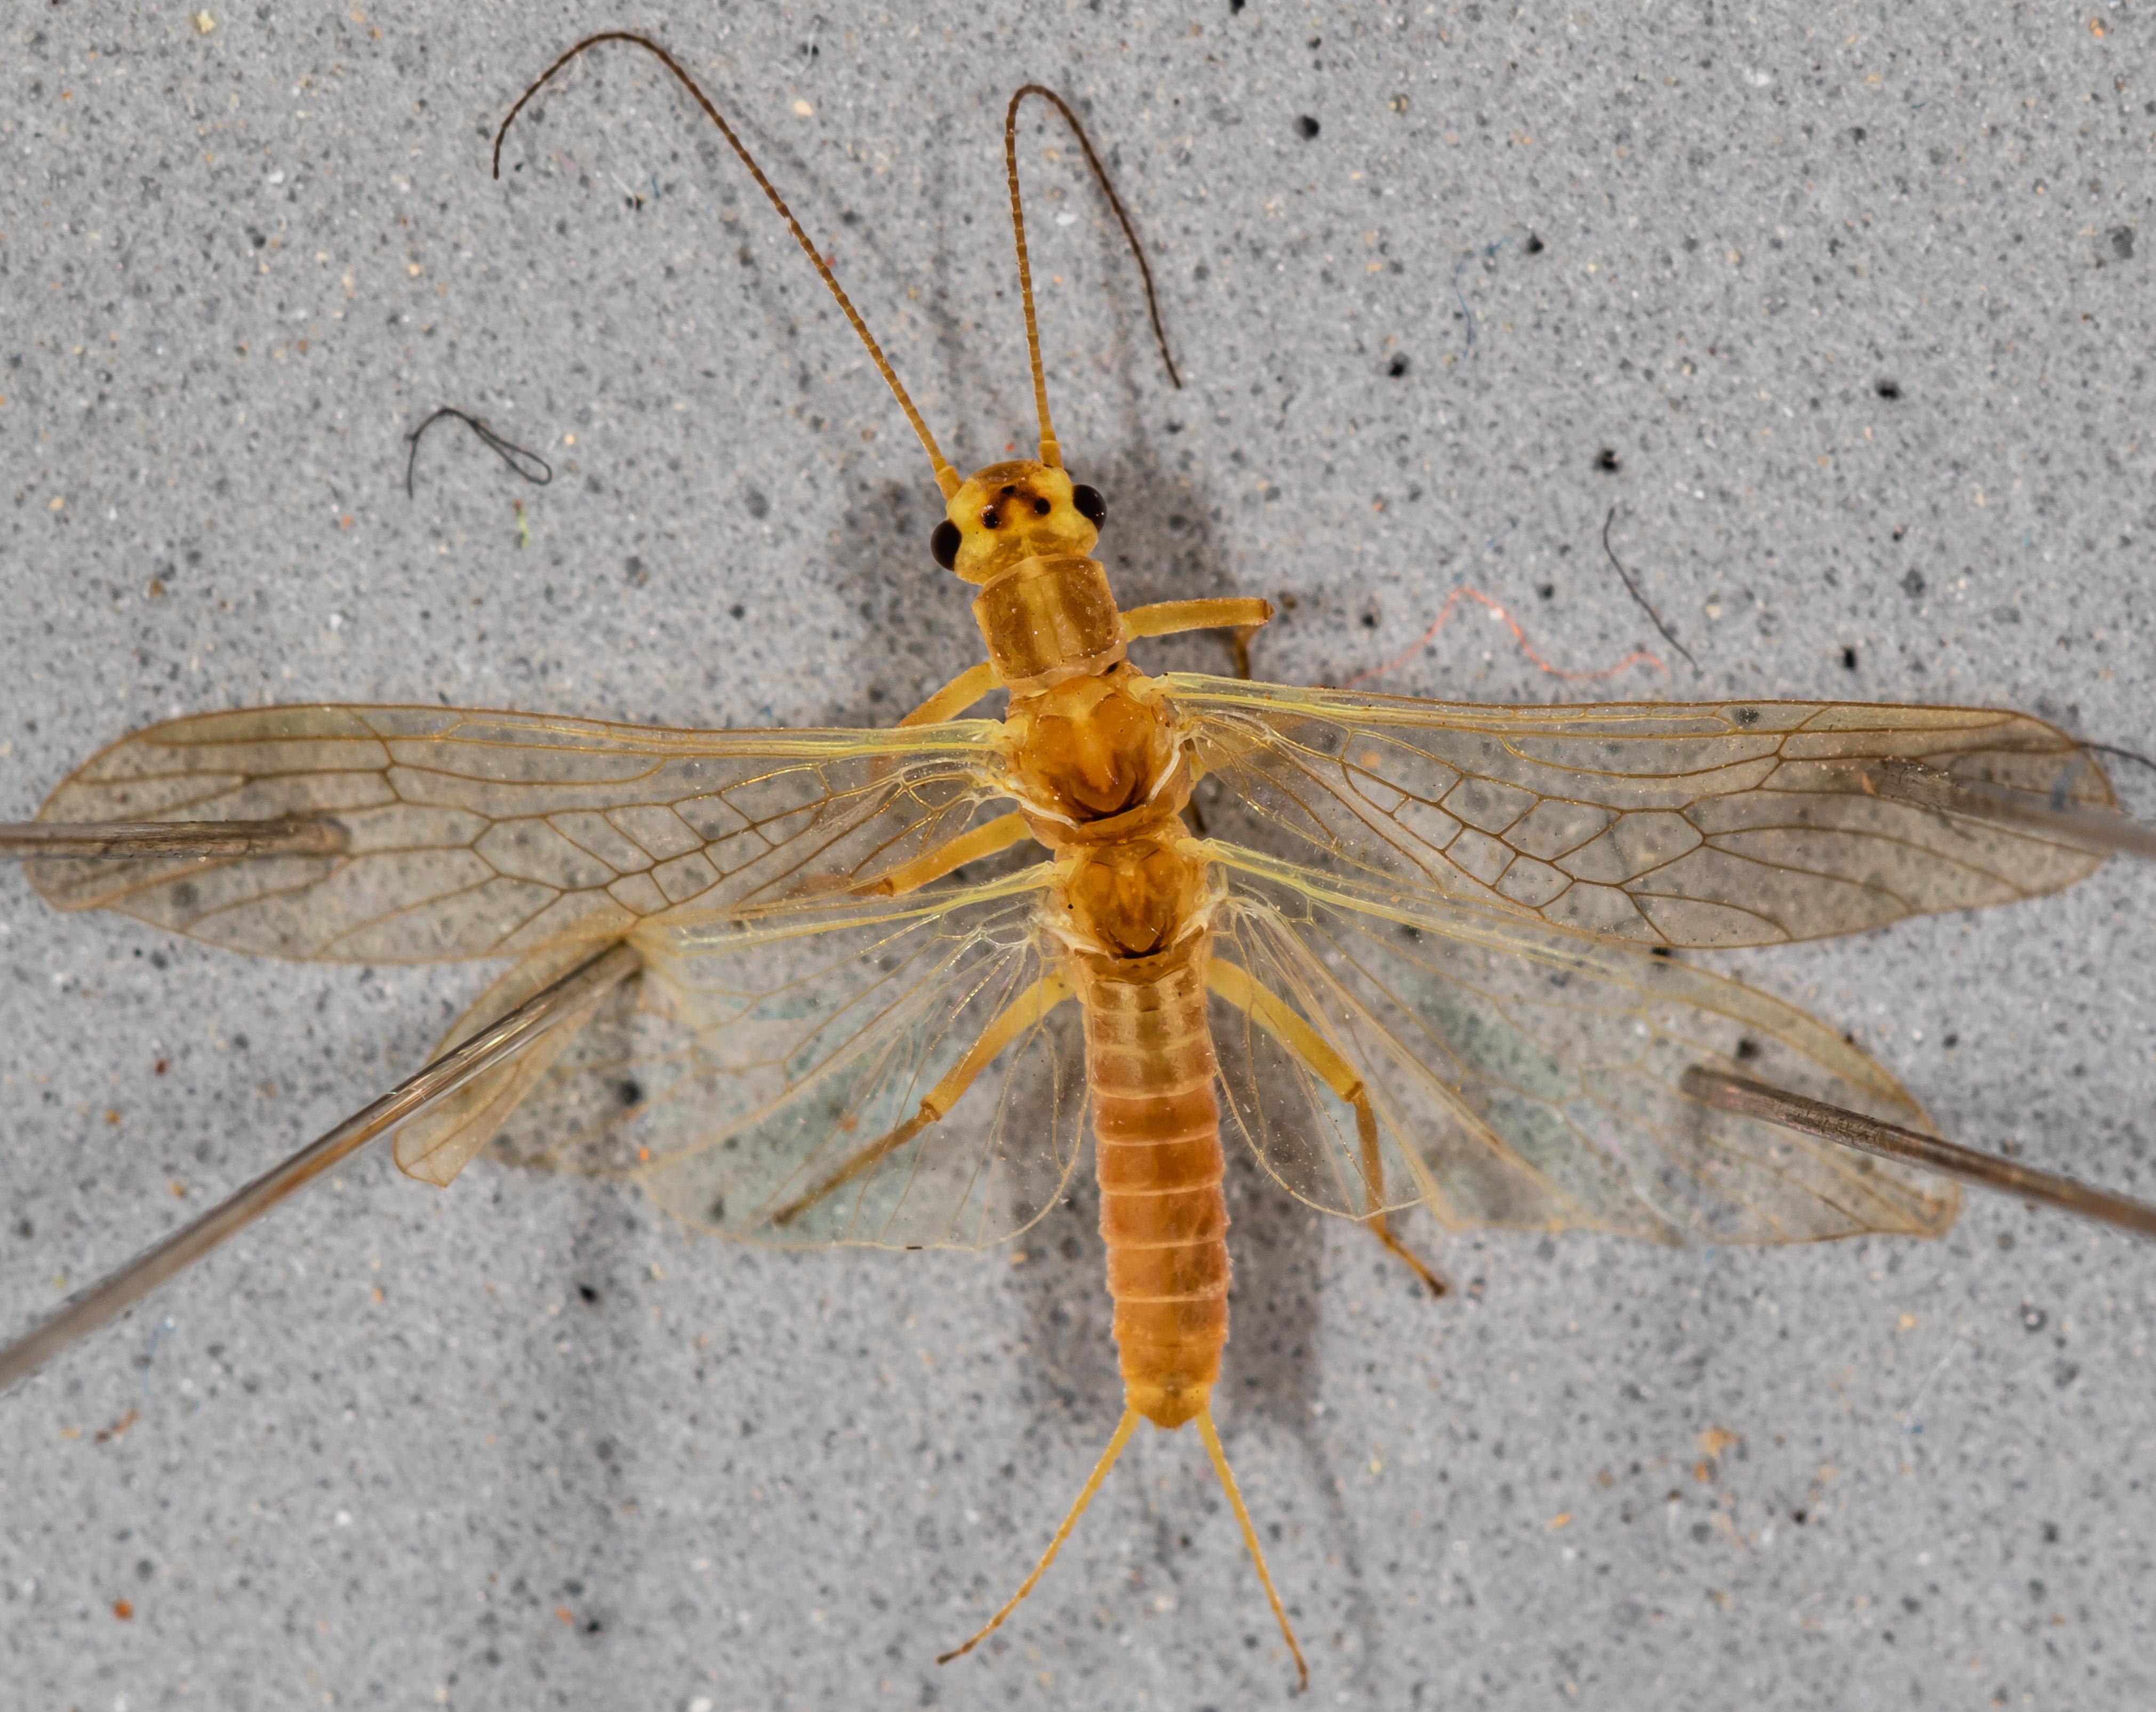 Female Isoperla fusca (Yellow Sally) Stonefly Adult from the Yakima River in Washington